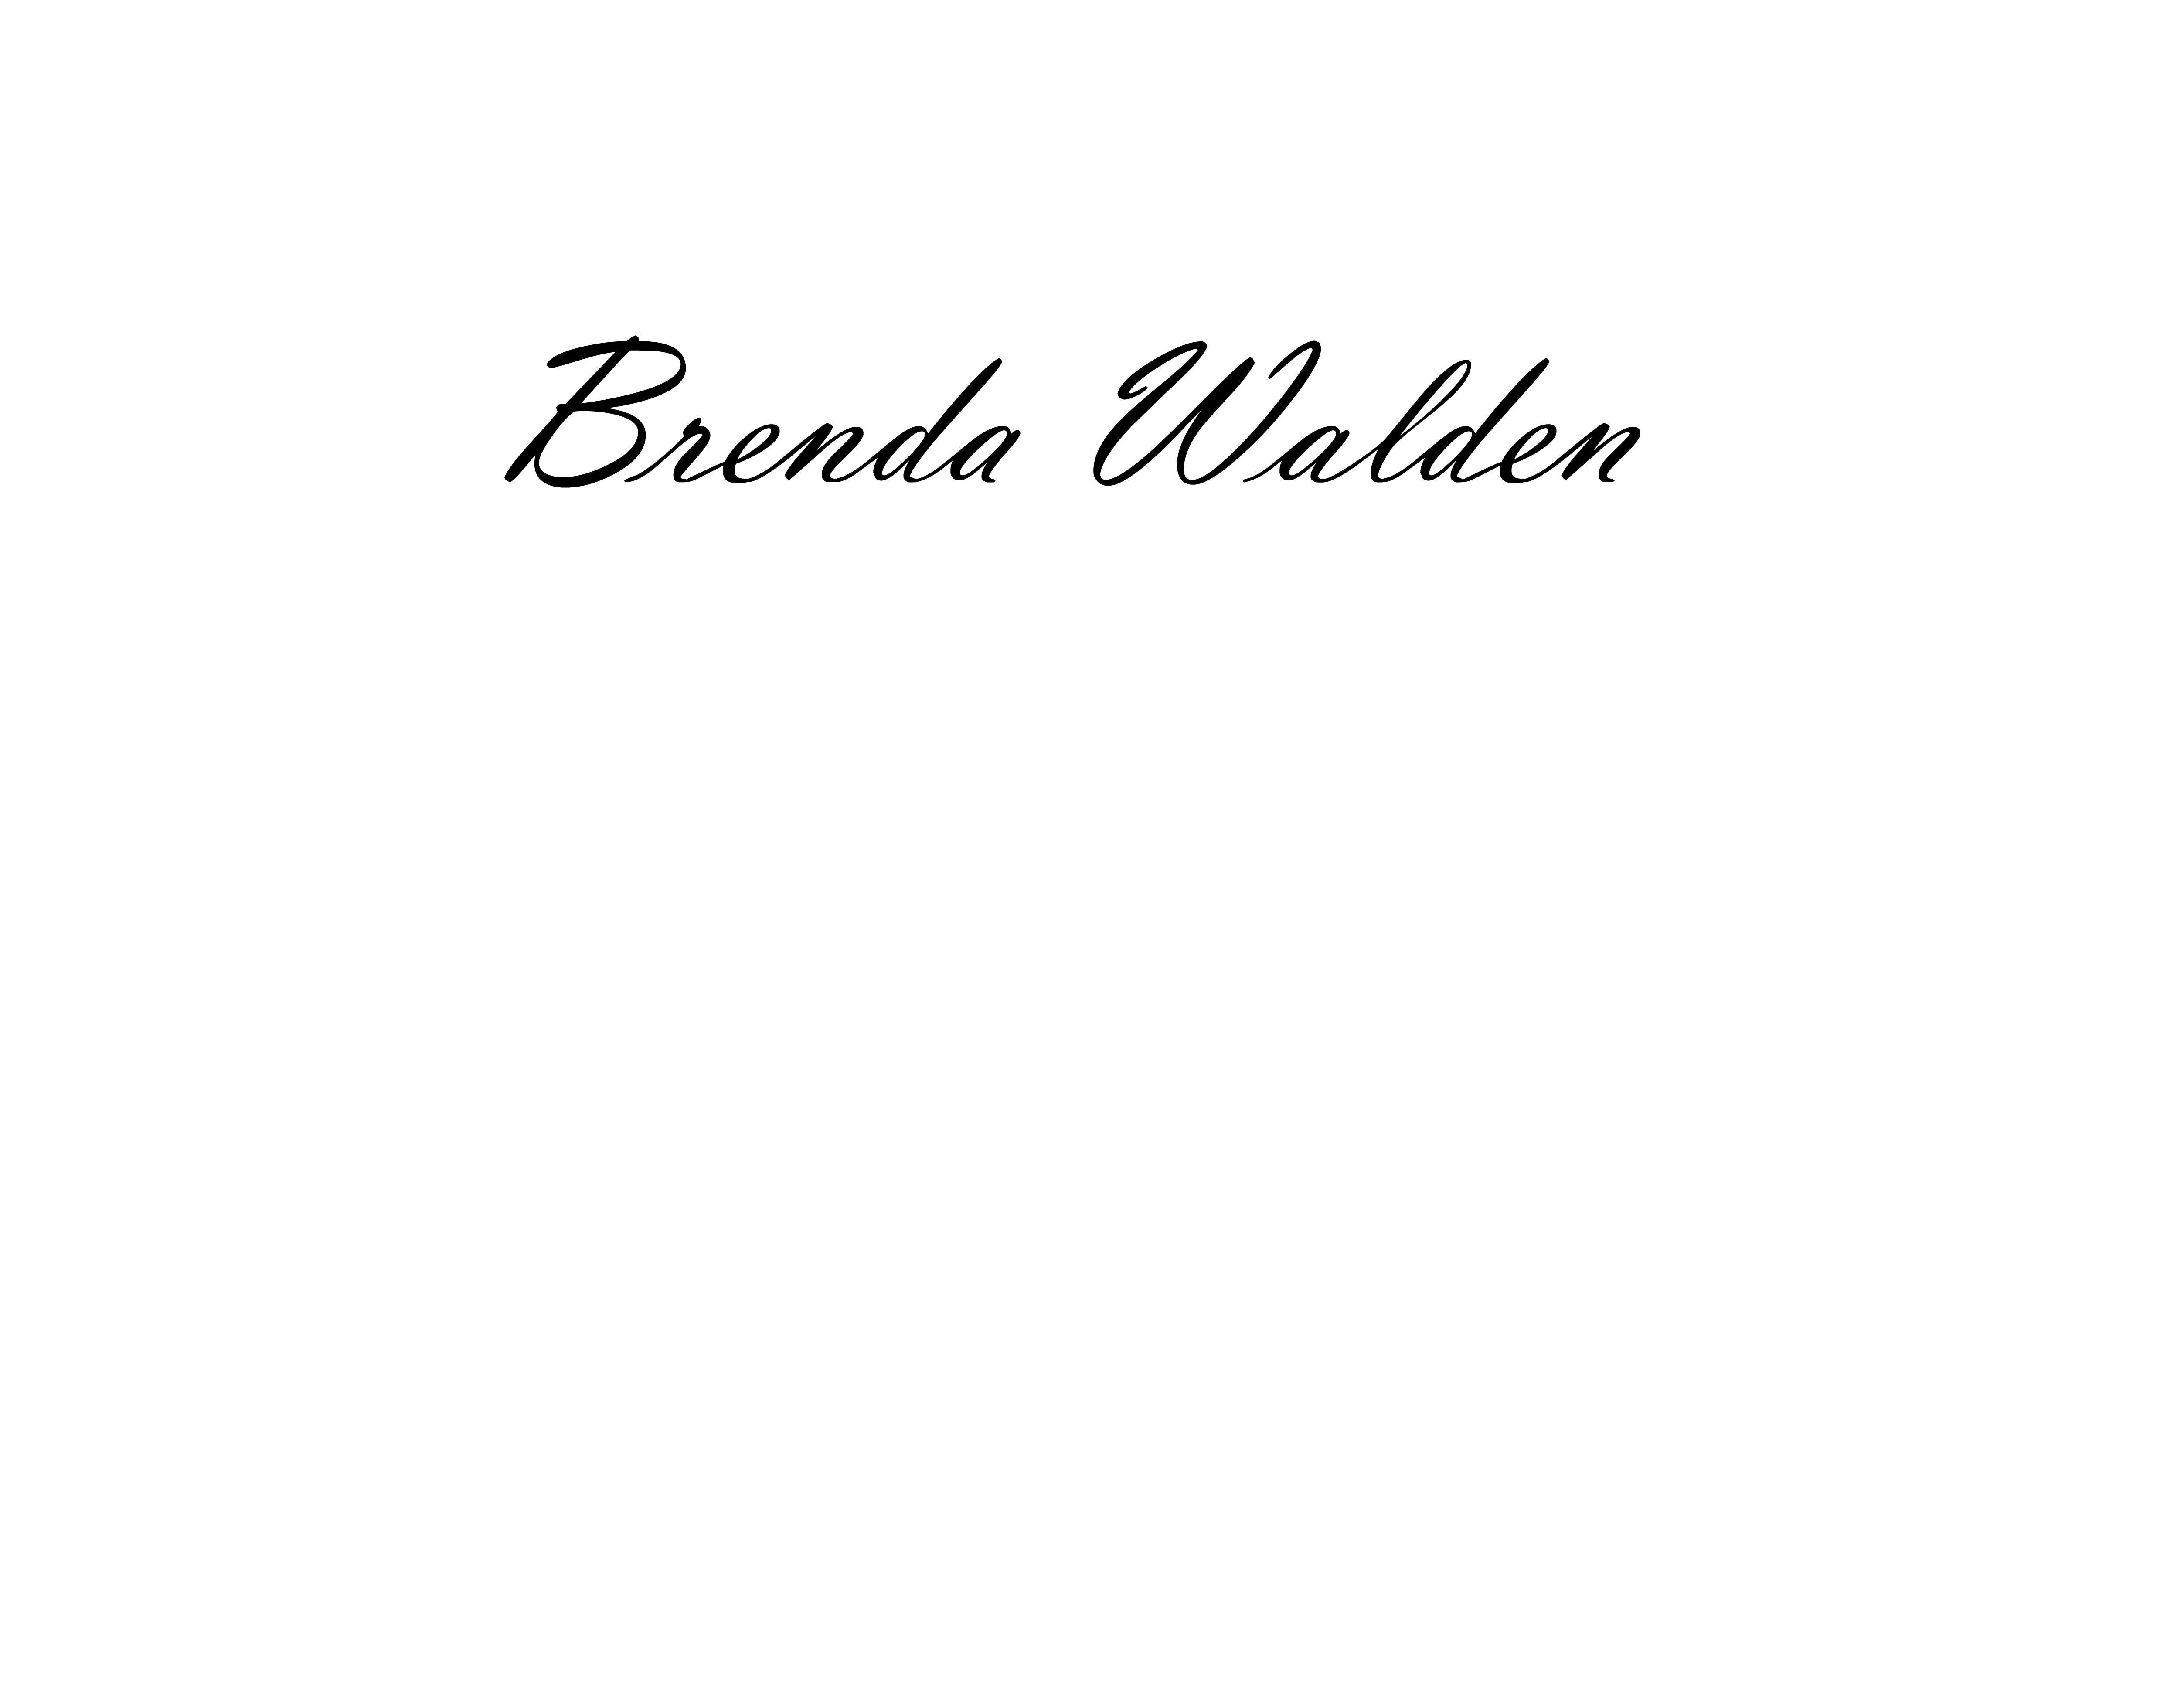 Brenda Walden's Signature